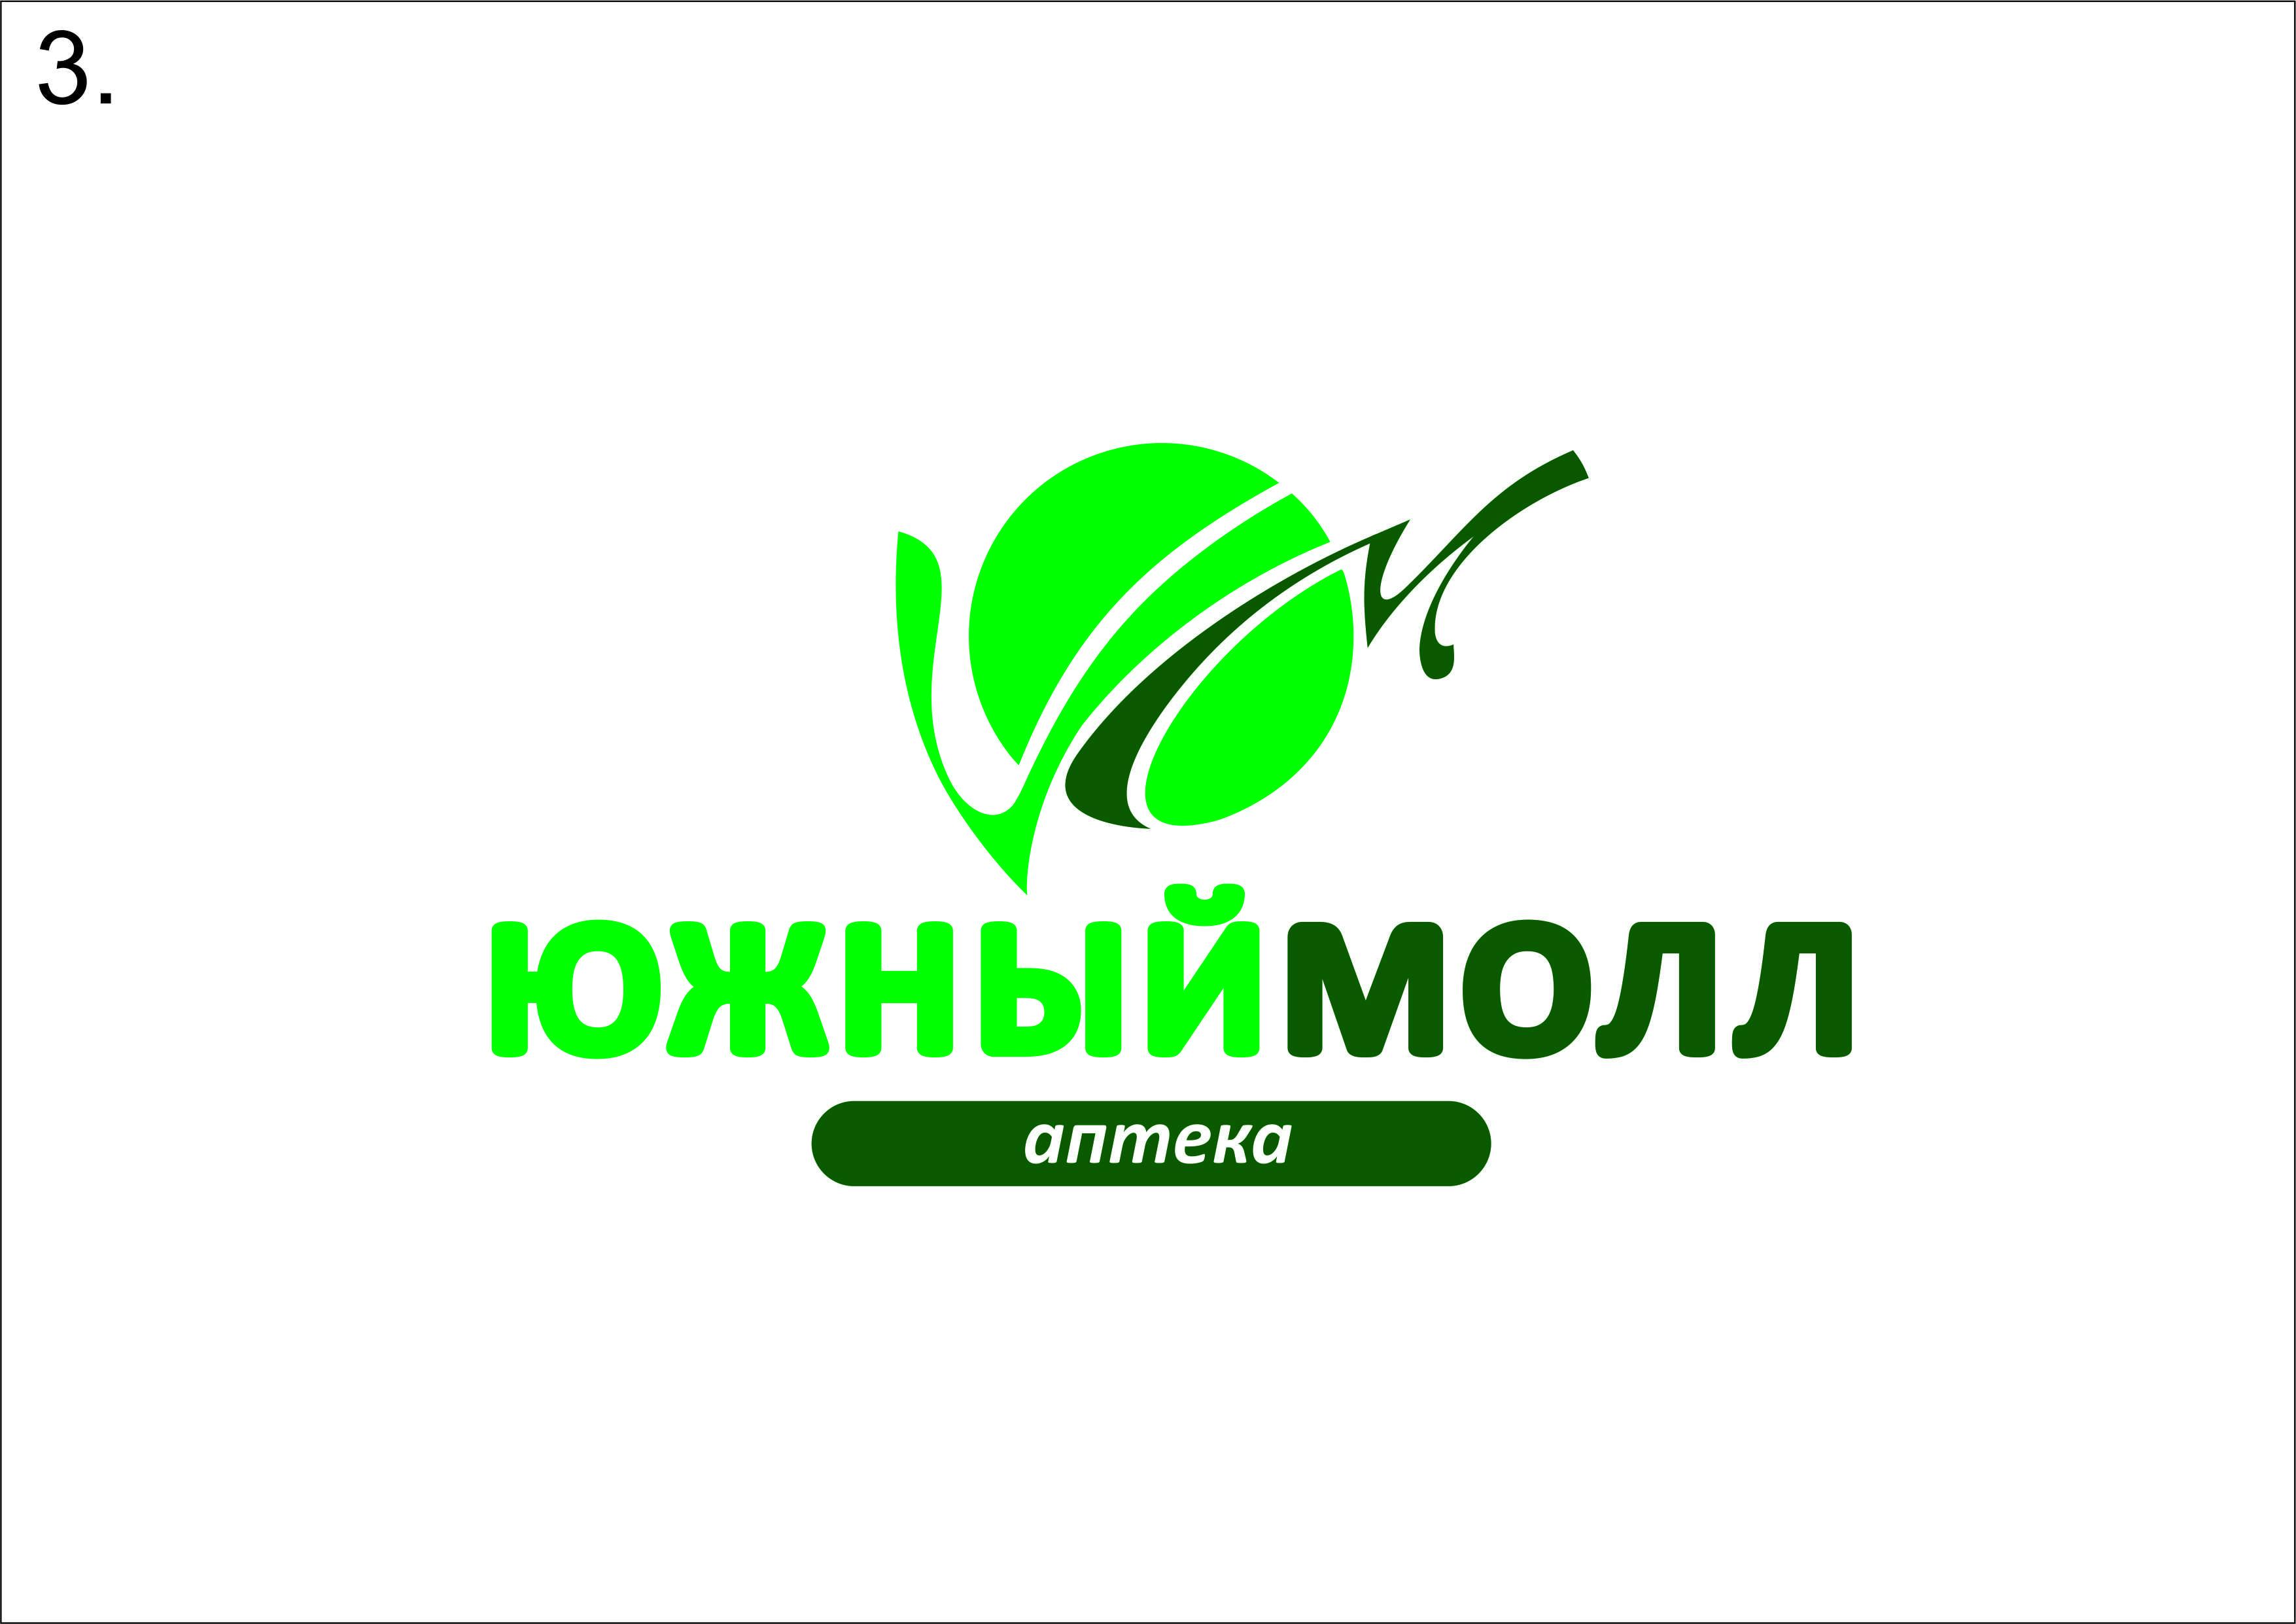 Разработка логотипа фото f_4db4c9ee24551.jpg